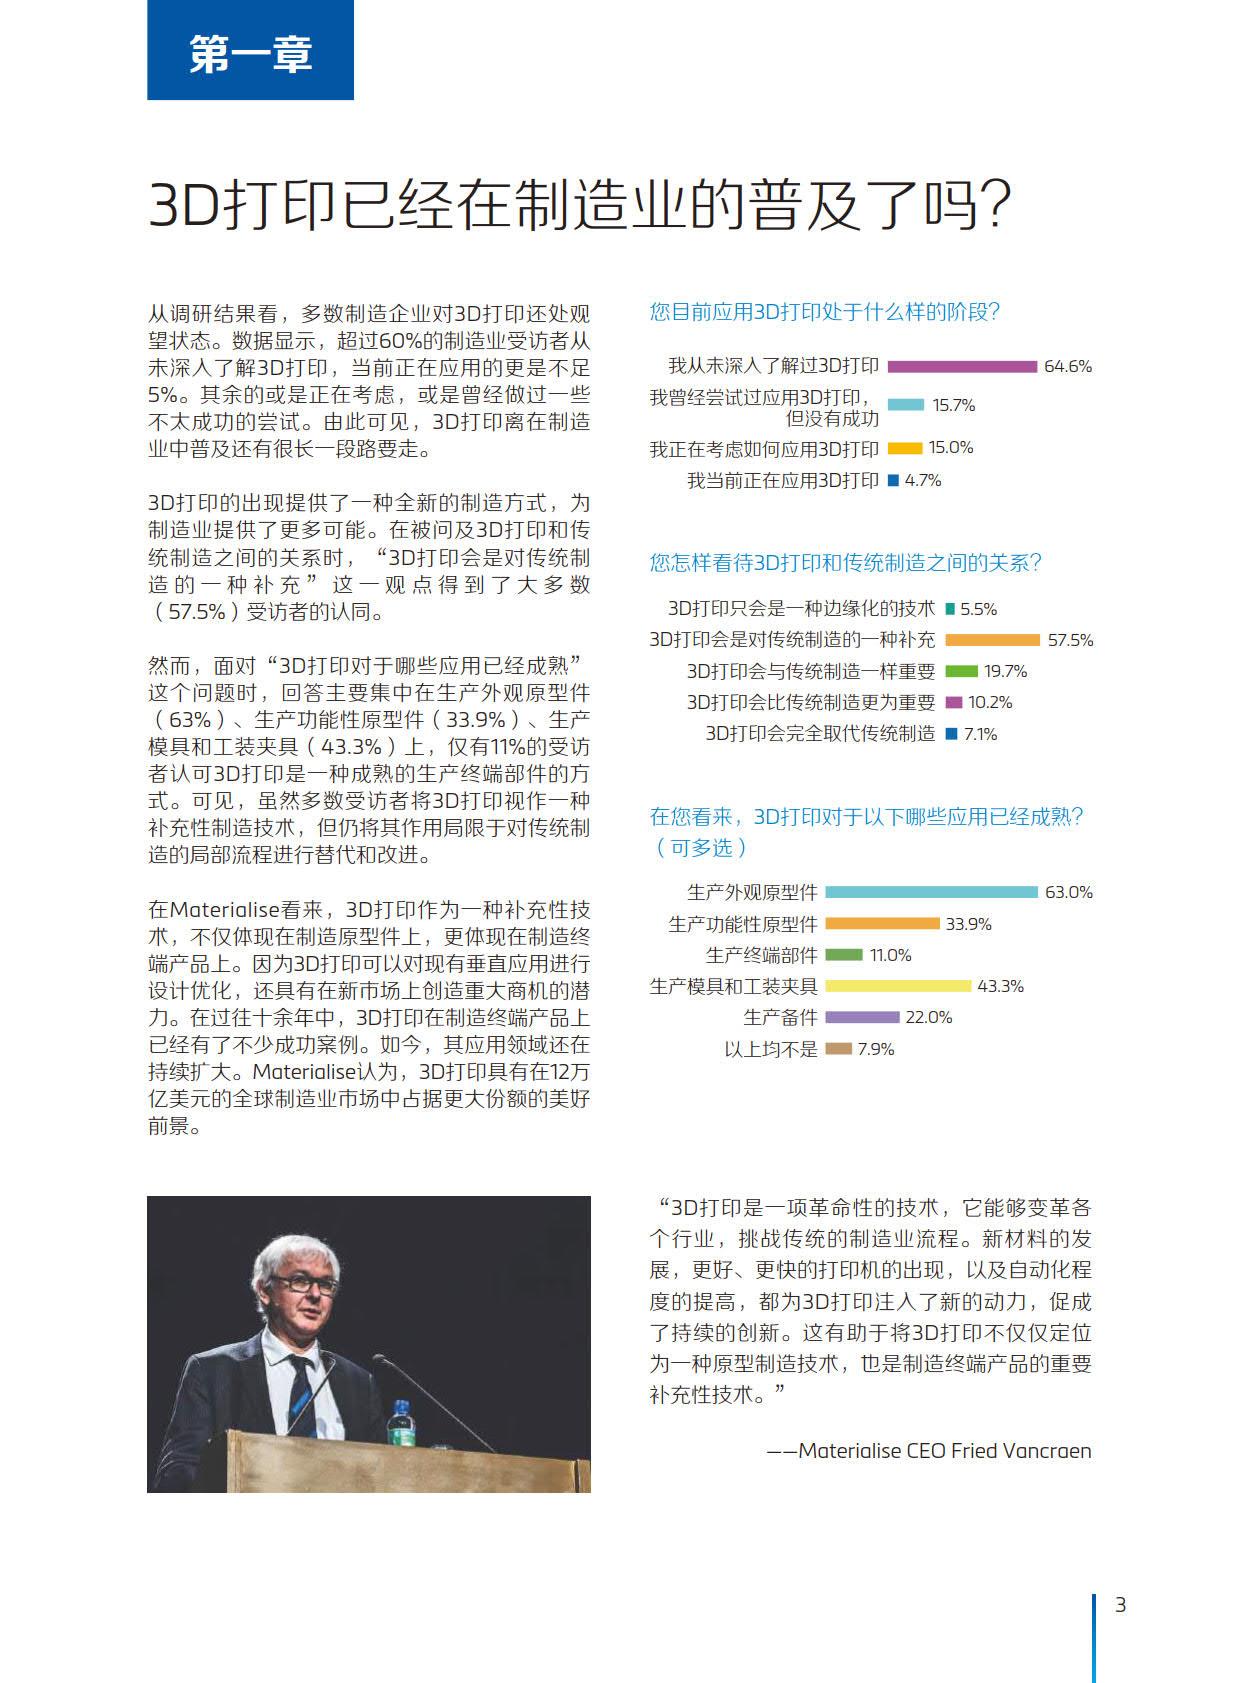 Materialise制造业调研报告_3.jpg